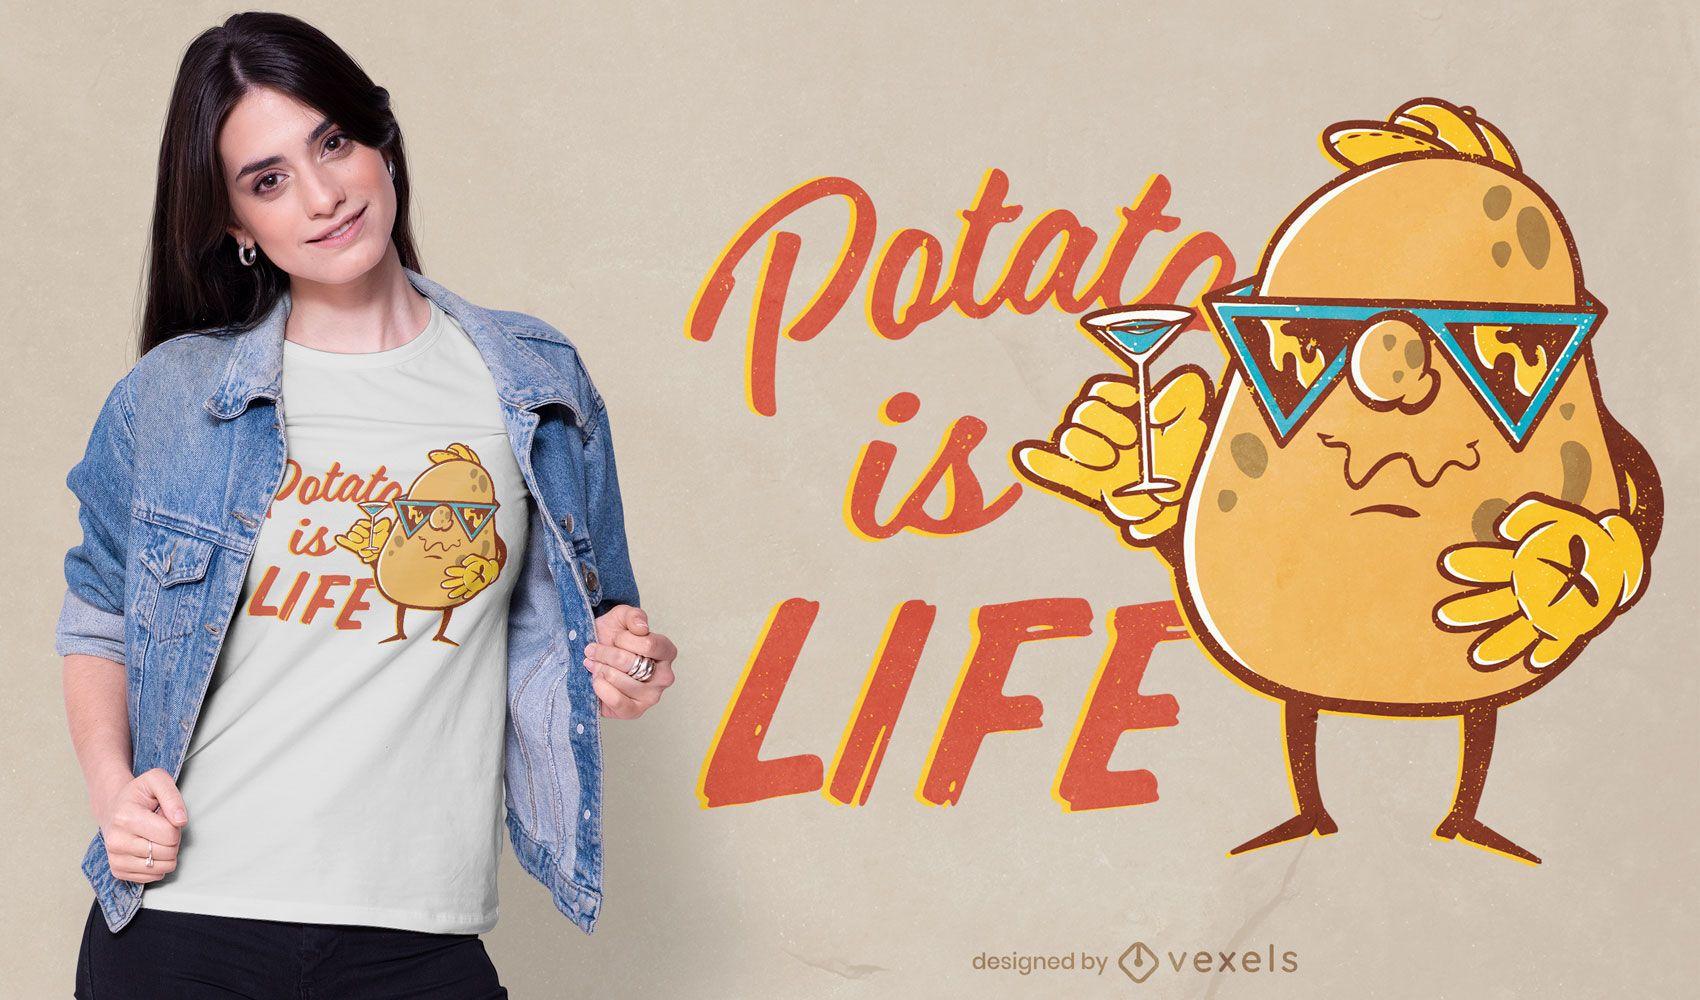 Potato is life t-shirt design